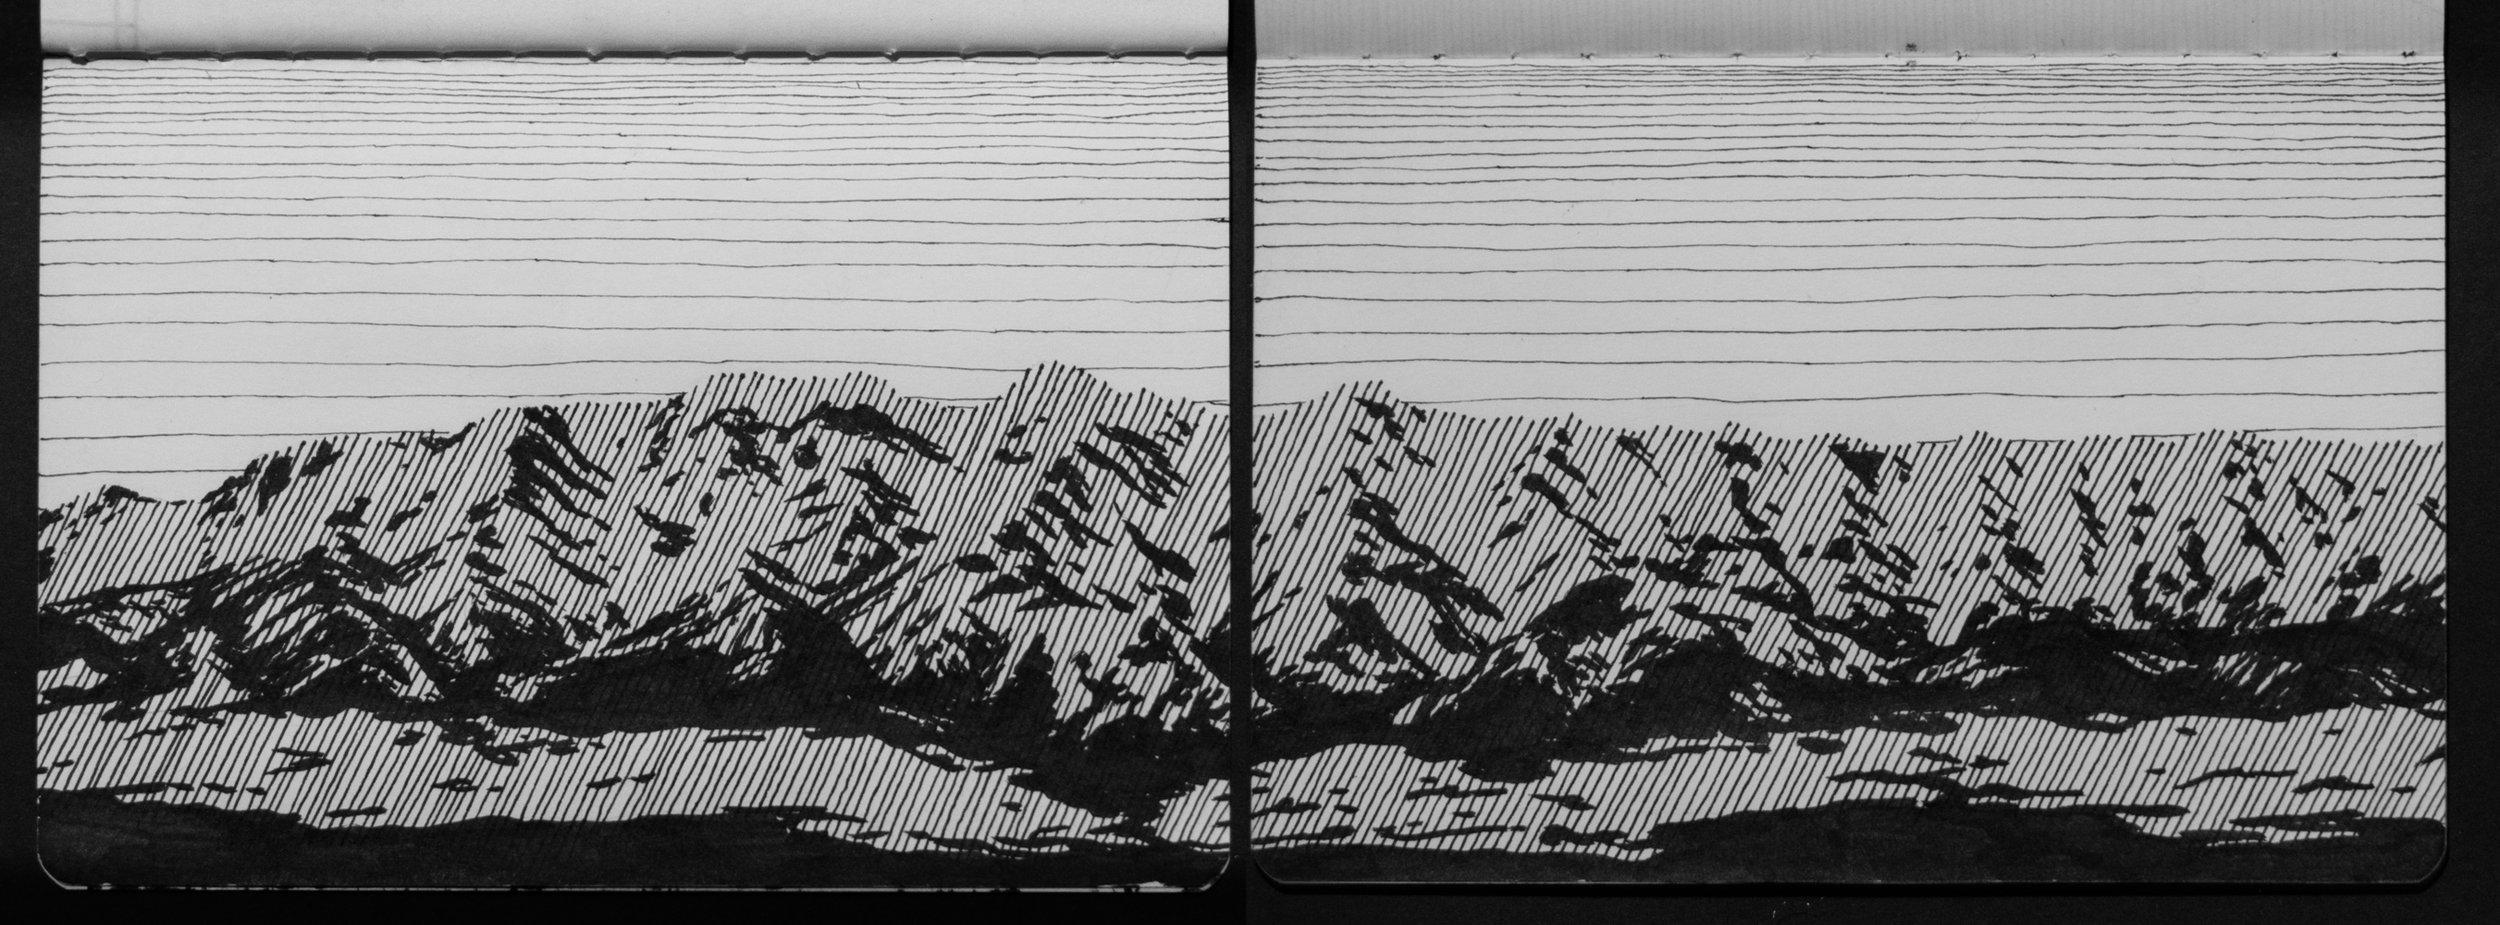 03-24 Wellsville Mountains Pano F.jpg